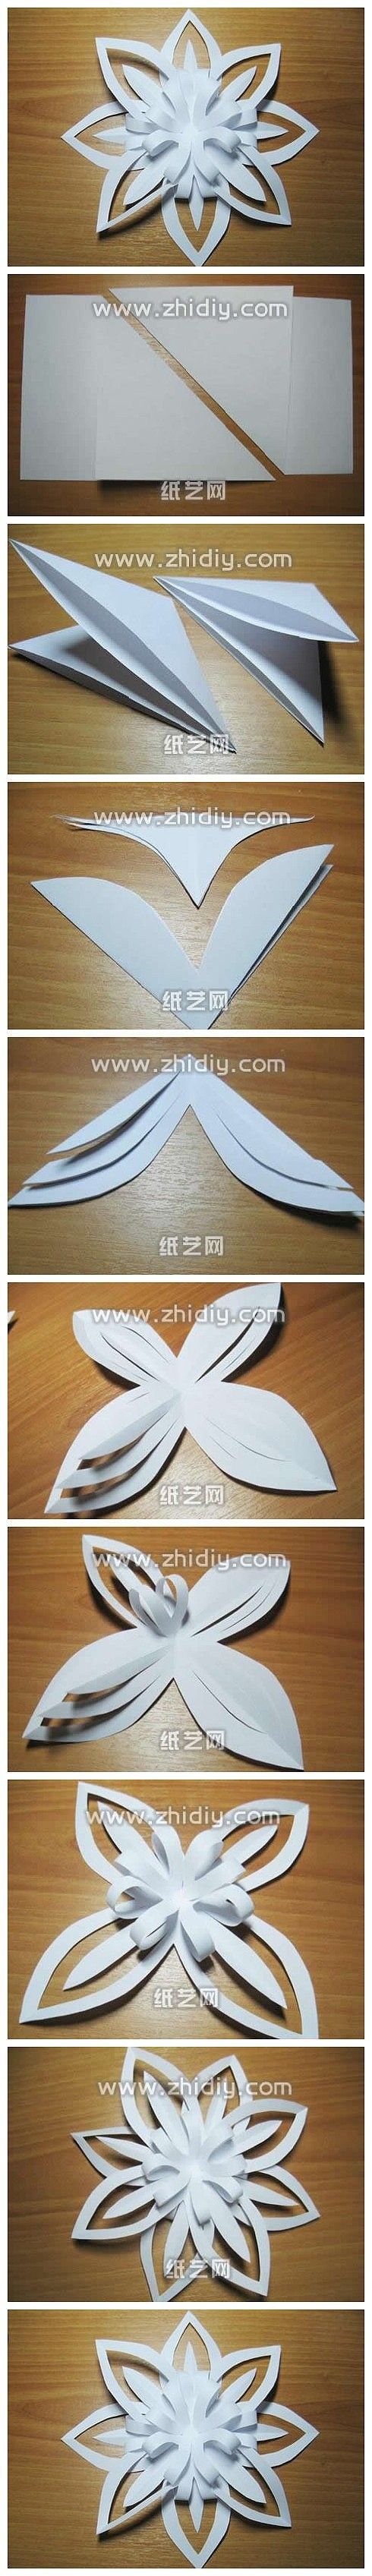 Beautiful paper art of origami fabric handmade DIY tutorial derivative paper snowflake tutorial